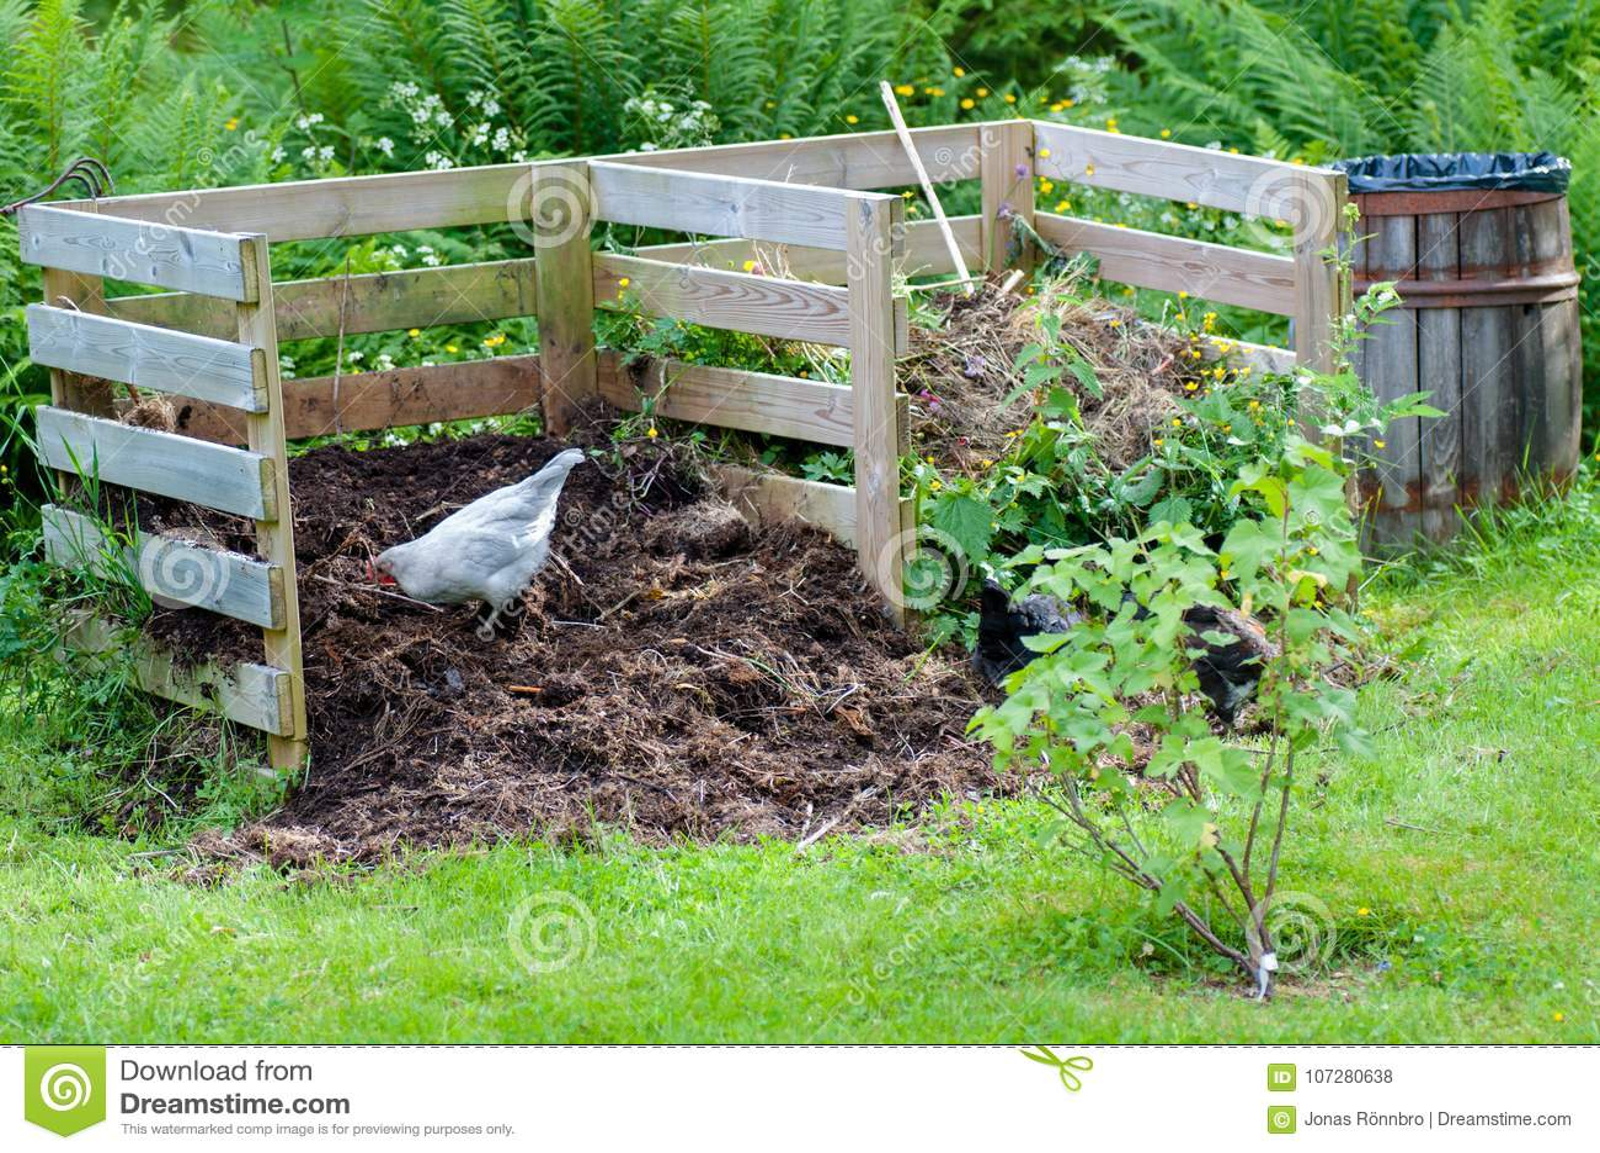 Hens working in the garden compost